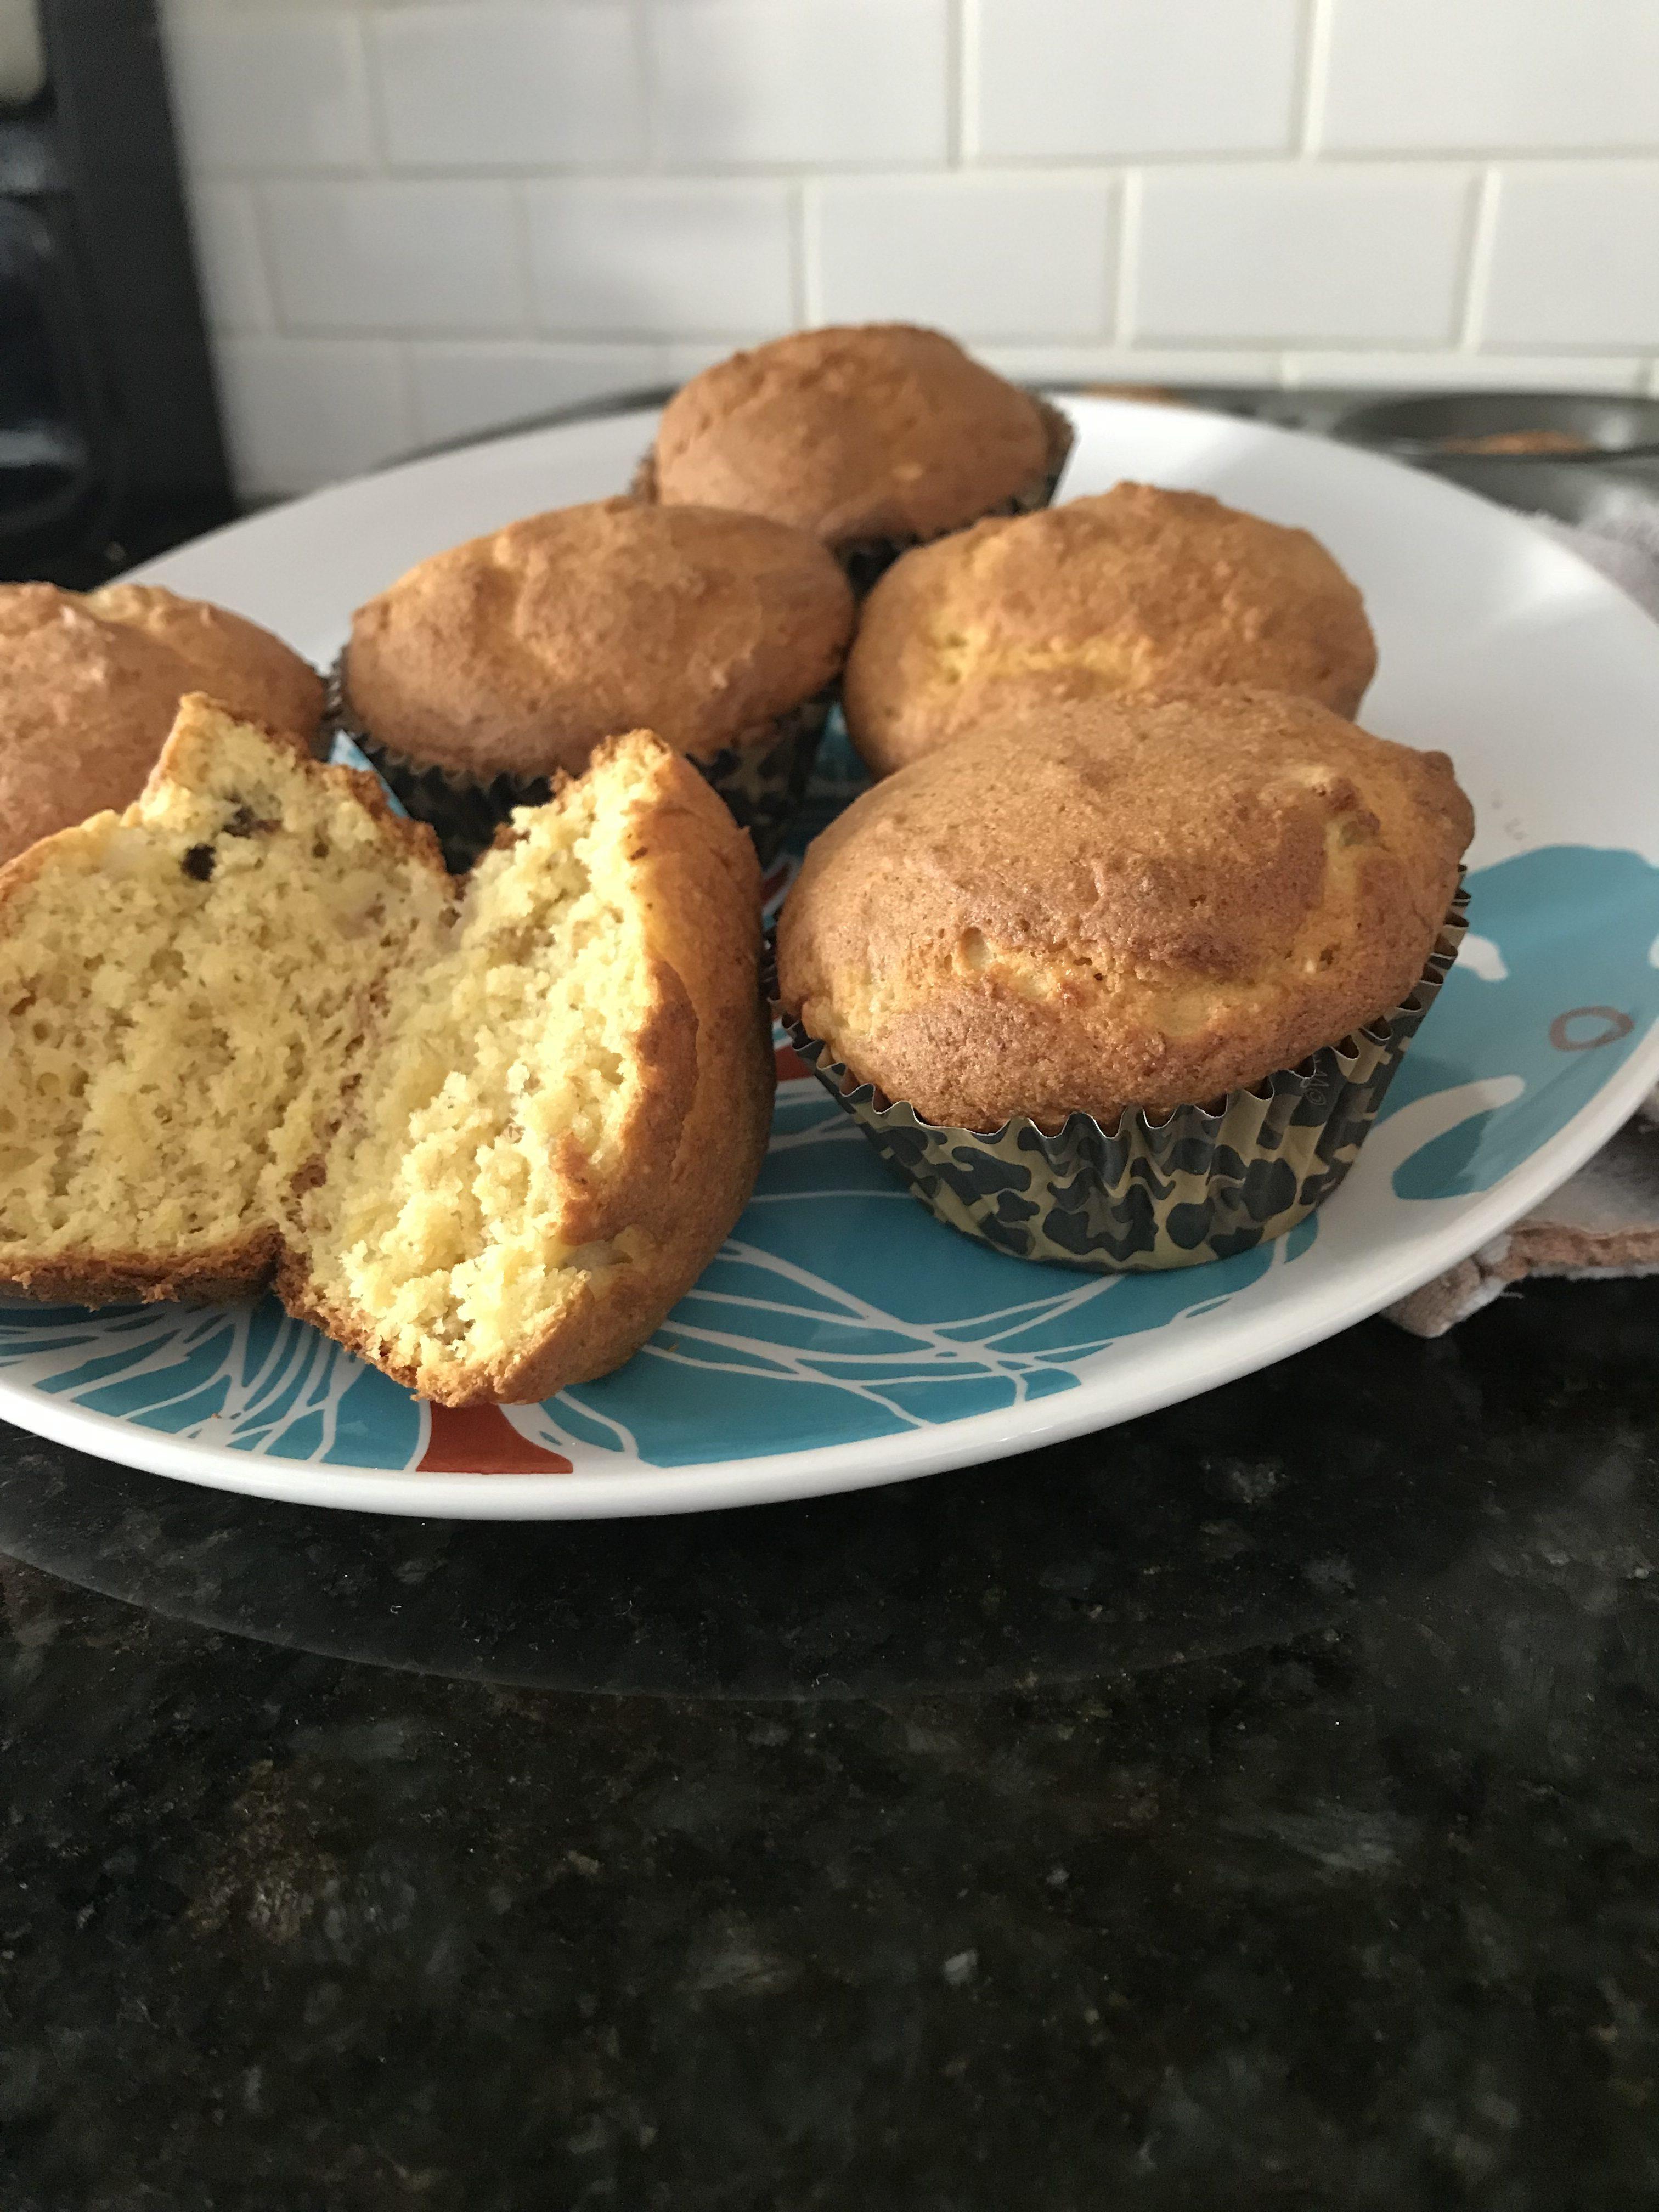 Weight Watchers Banana Chocolate Chip Muffin Recipe- Just 4 Smart Points per muffin!